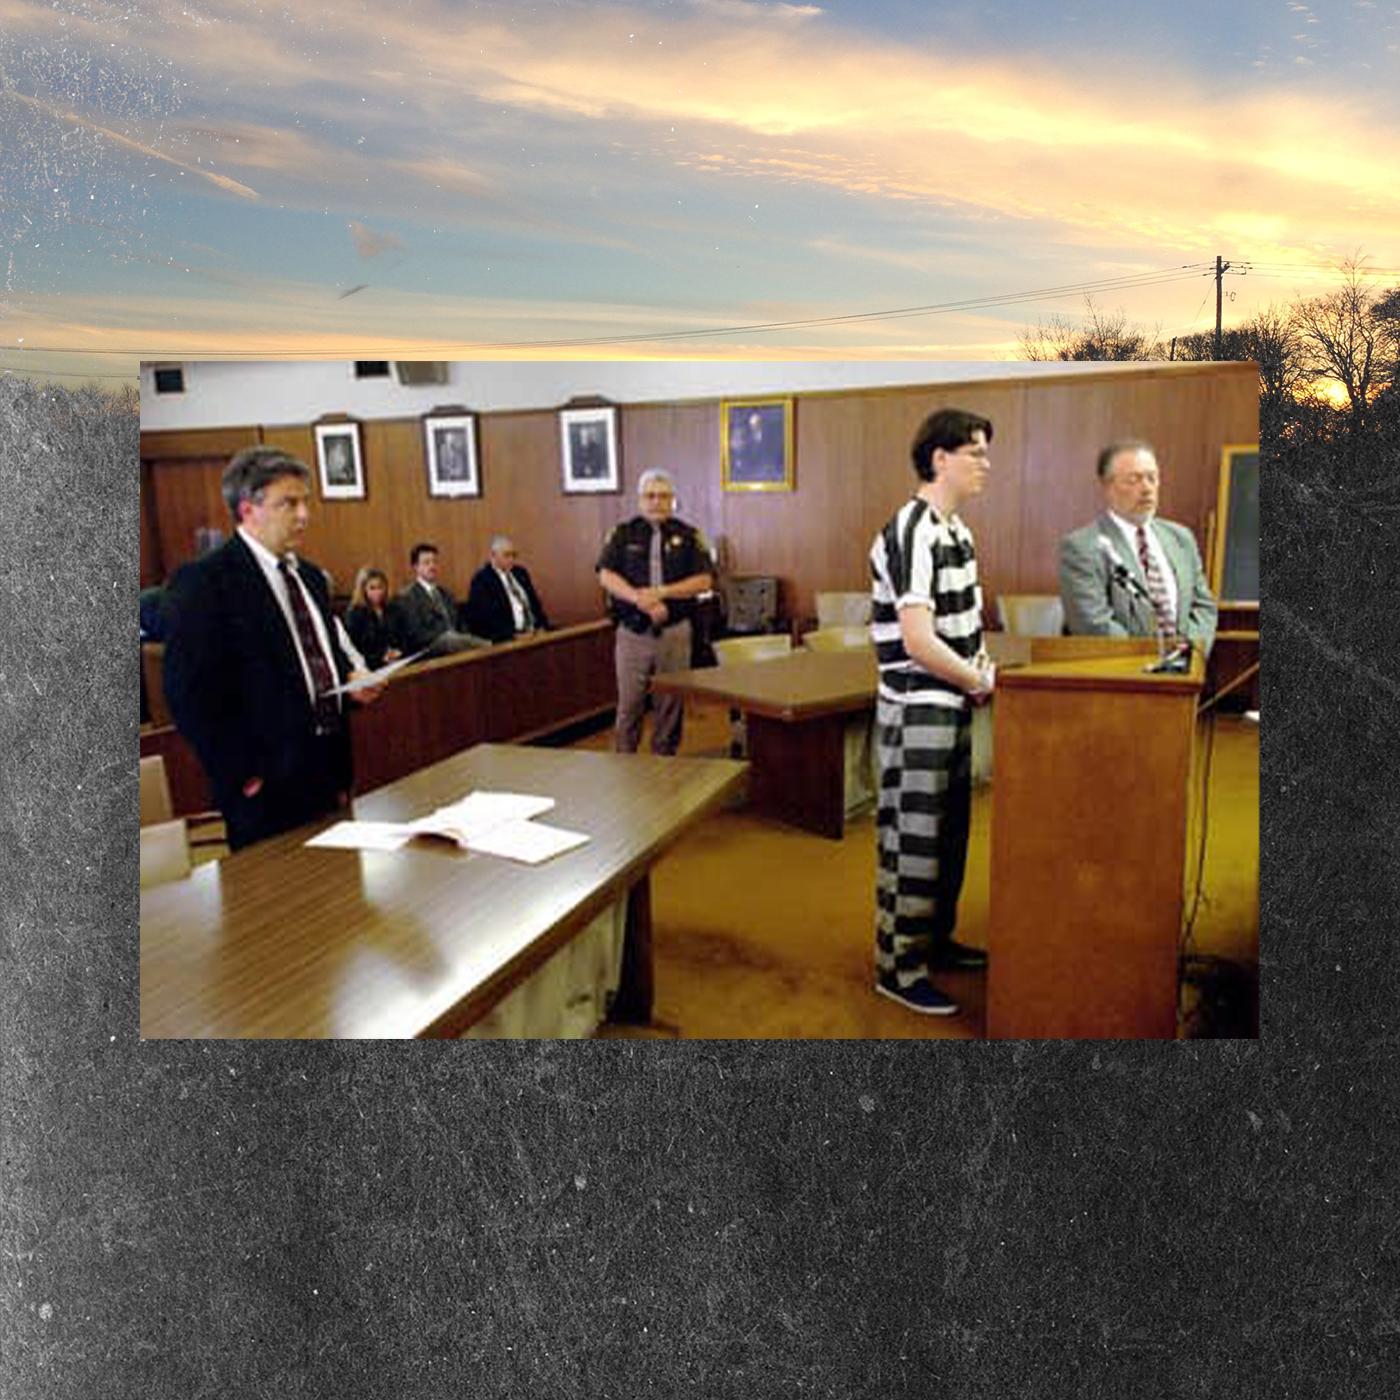 Seth Privacky in court